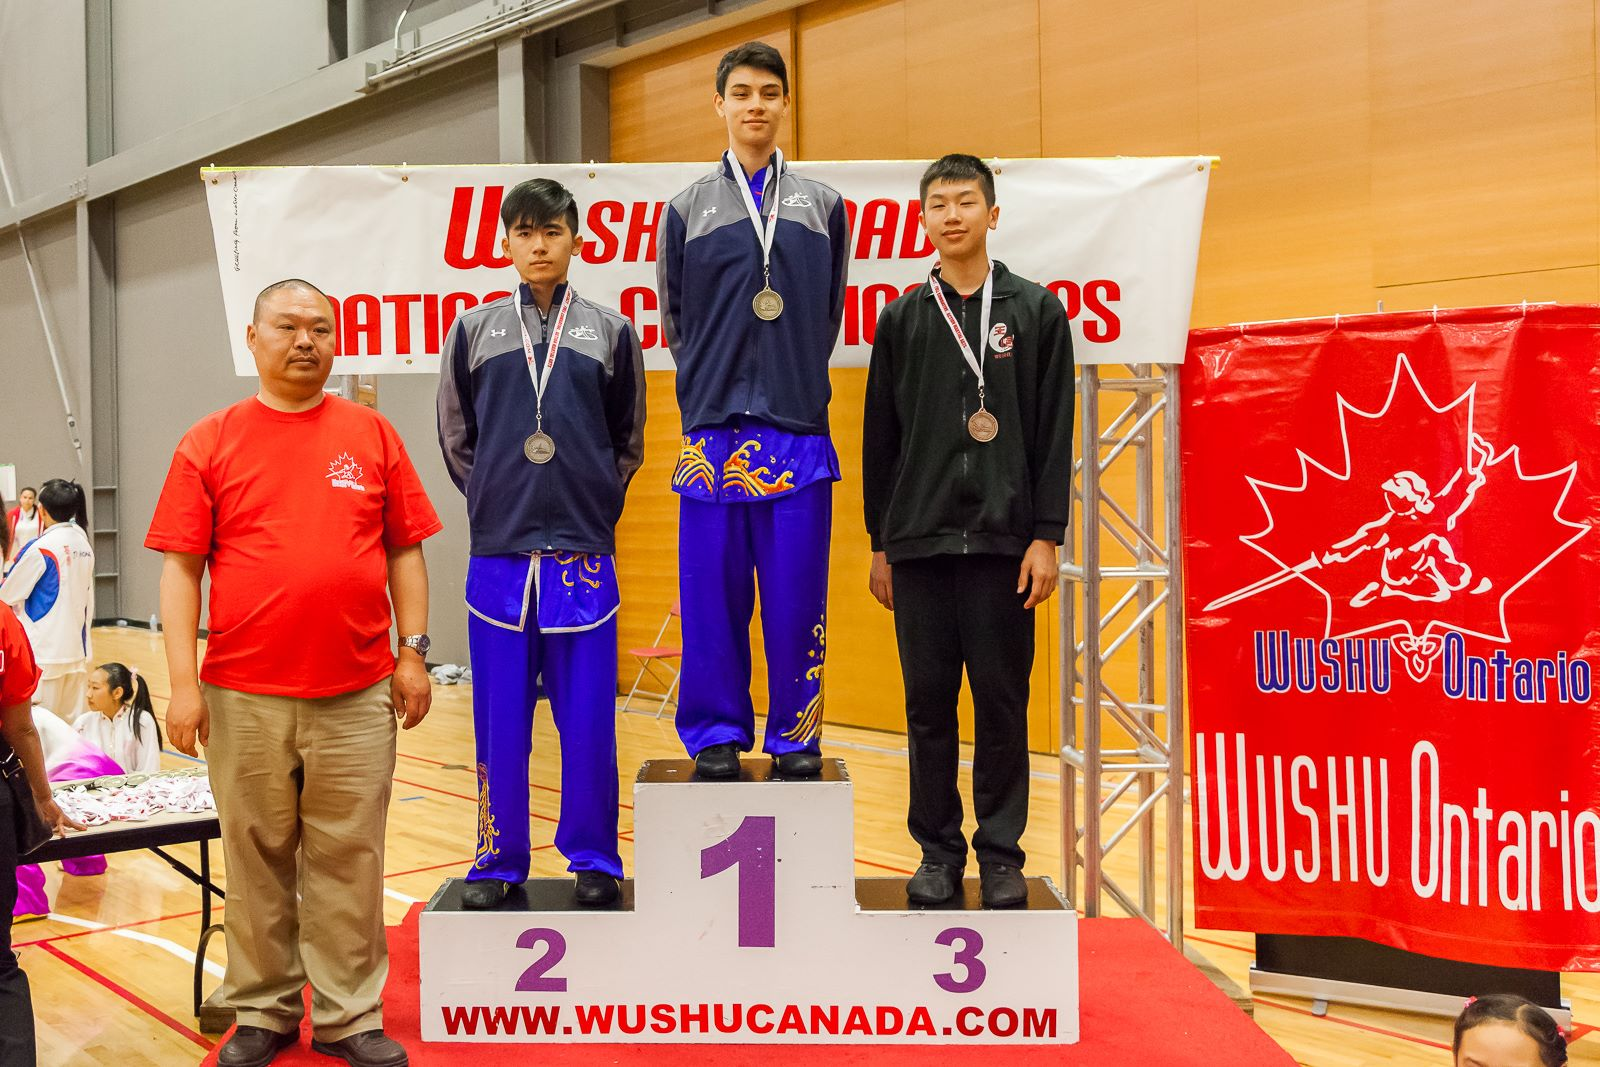 Wayland_Li_Wushu_Canadian_Nationals_2016_Medal_Ceremony_2.jpg